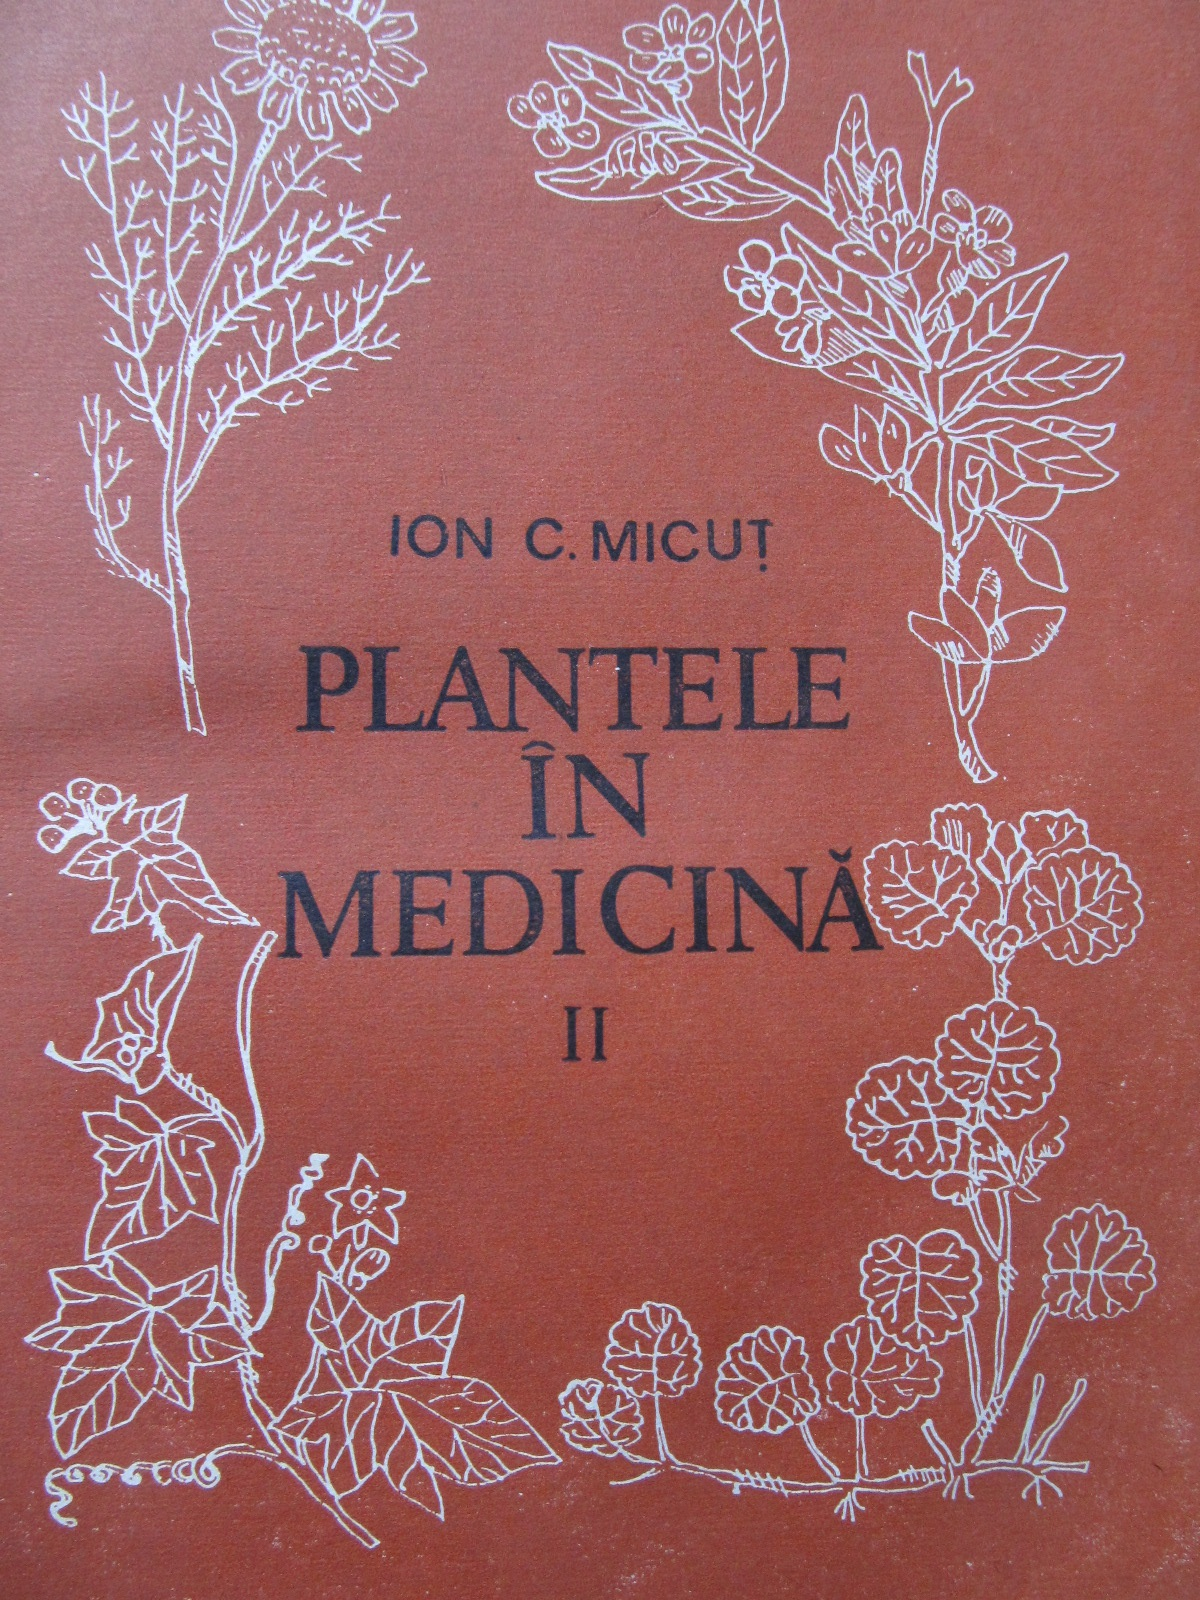 Plantele in medicina (vol. 2) - Ion C. Micut | Detalii carte